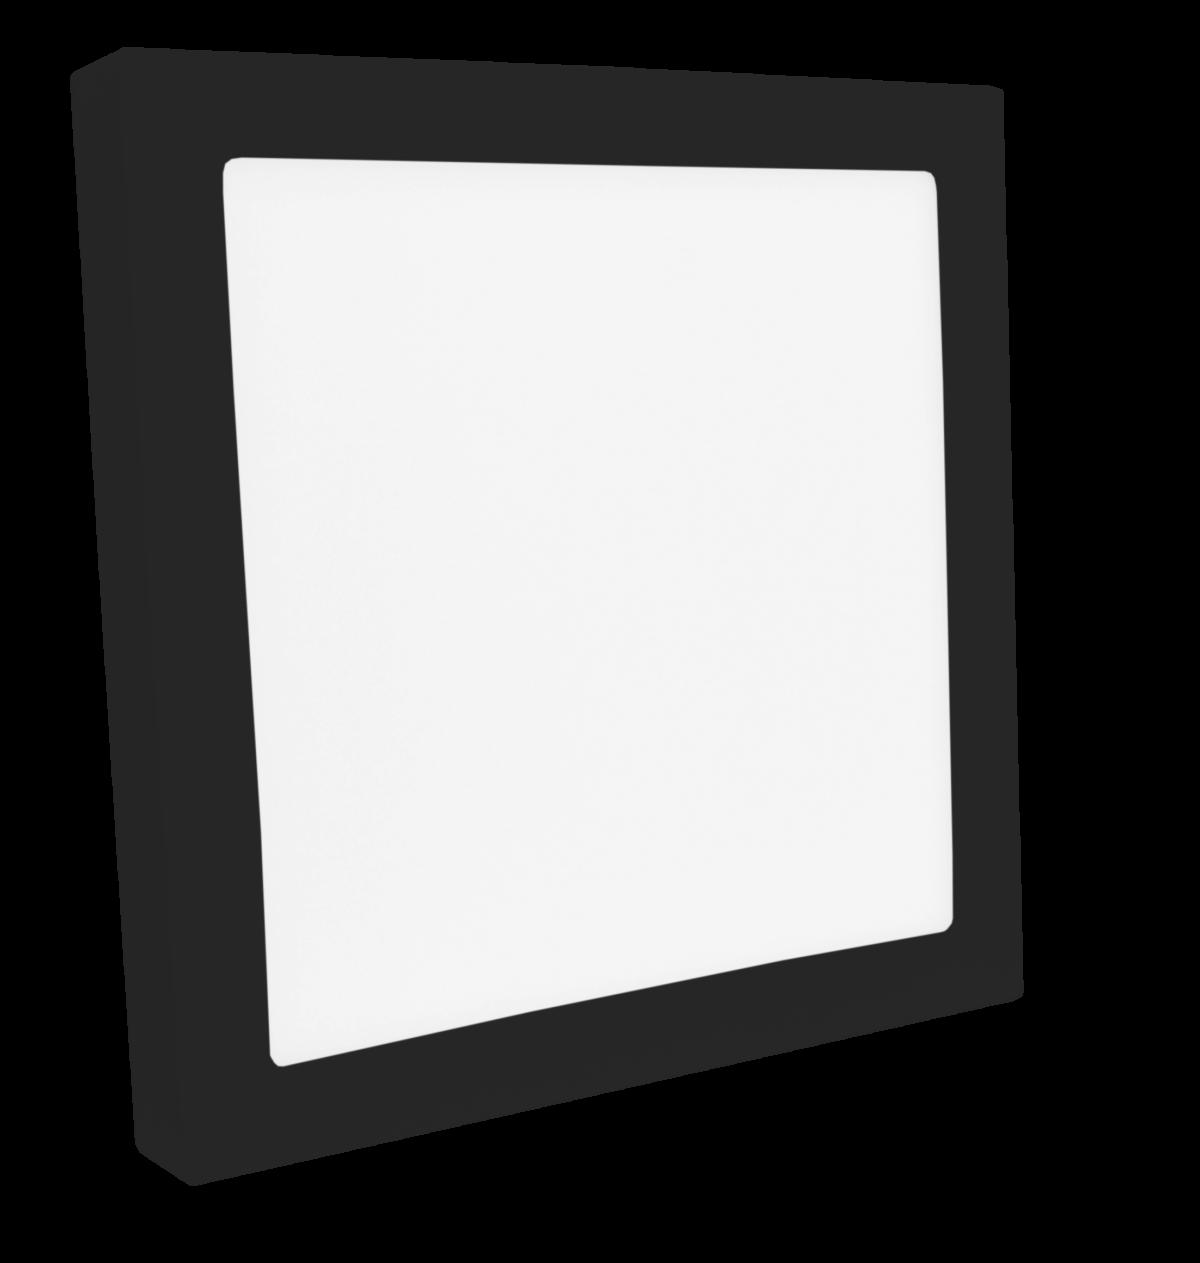 Luminária Sobrepor LED Save Energy SE-240.1637 Jet Black 36W 3000K Bivolt 400x400mm Preto